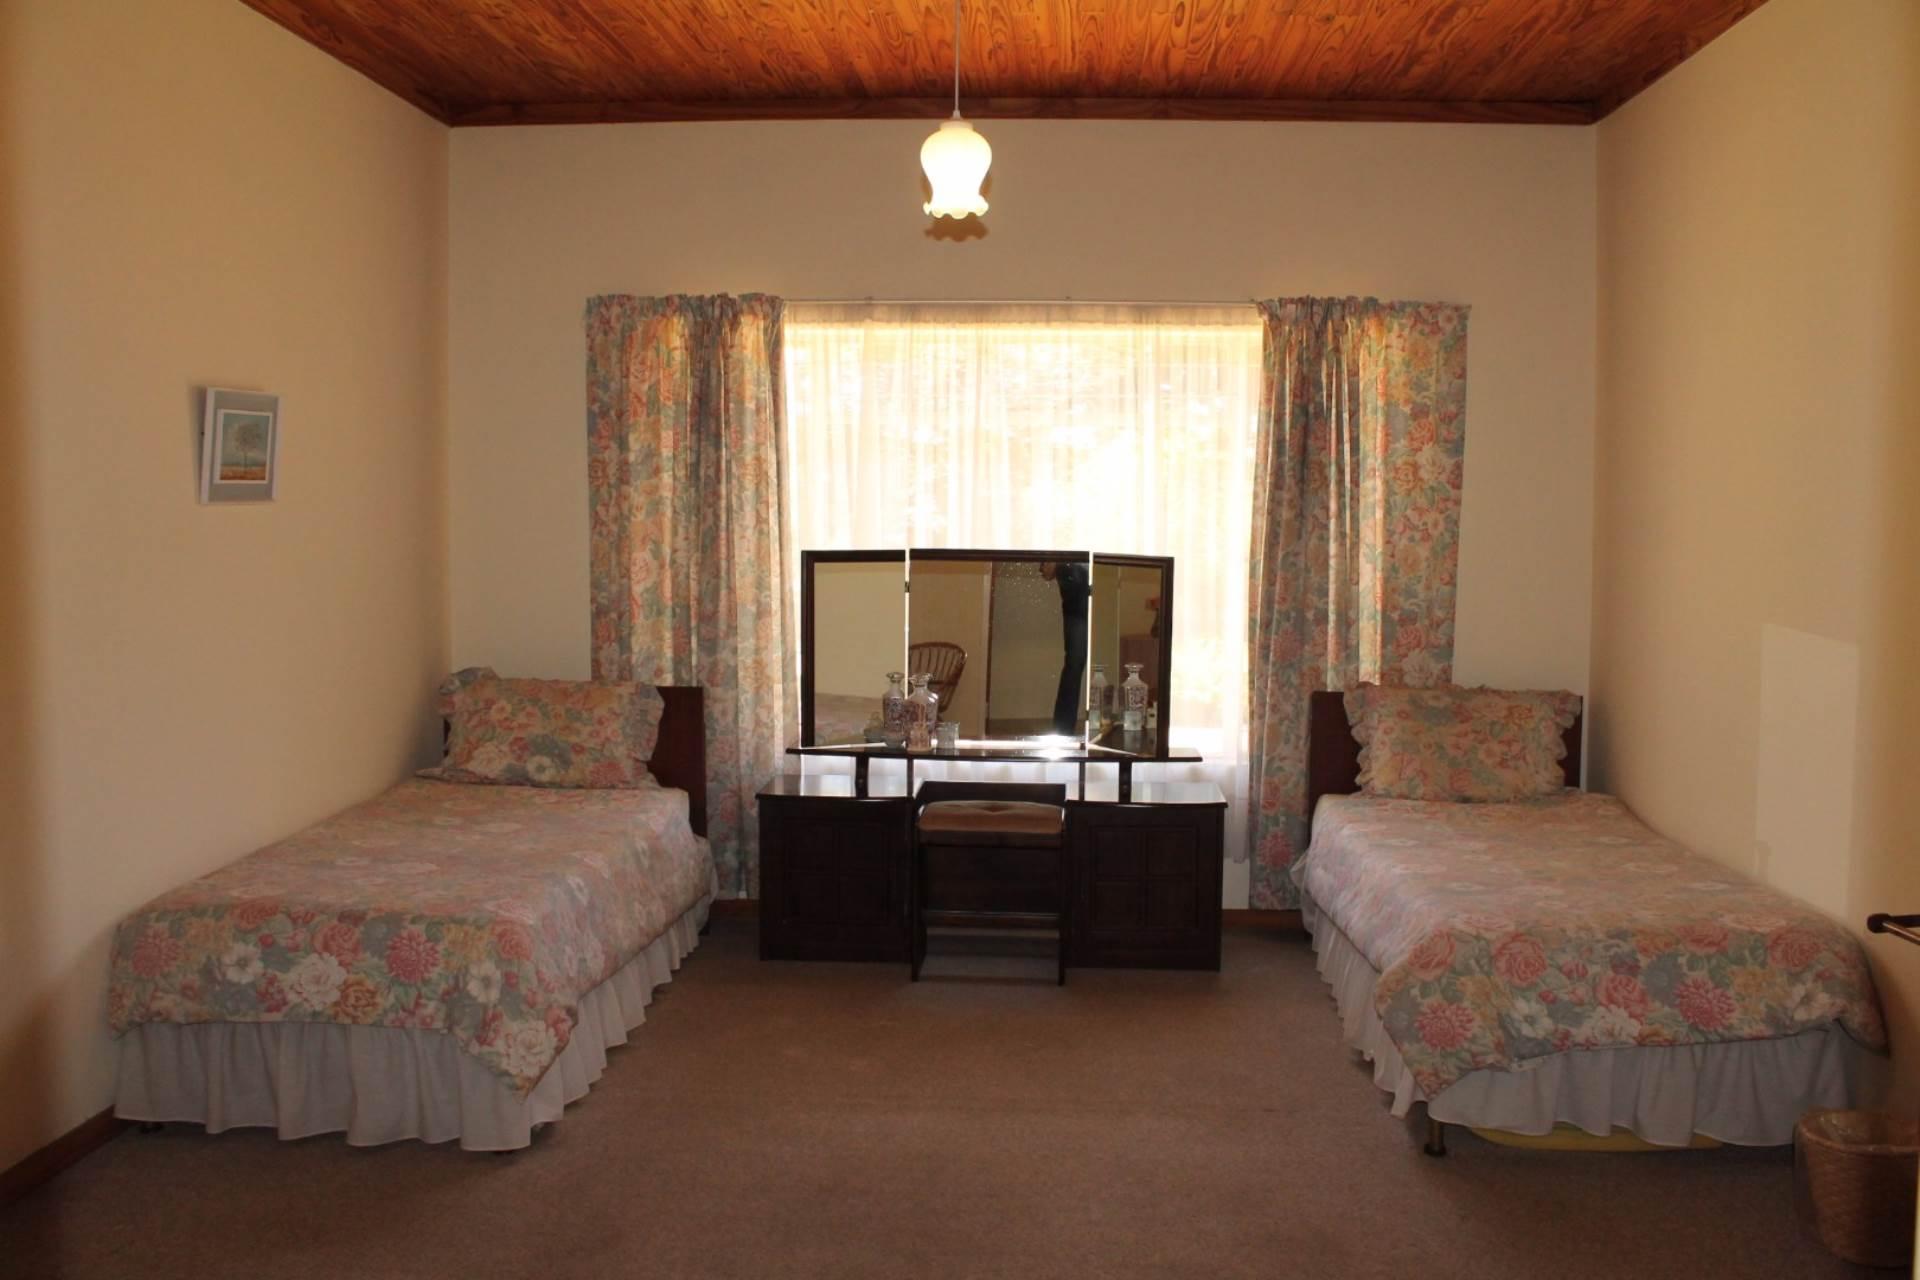 Amandasig property for sale. Ref No: 13552875. Picture no 12